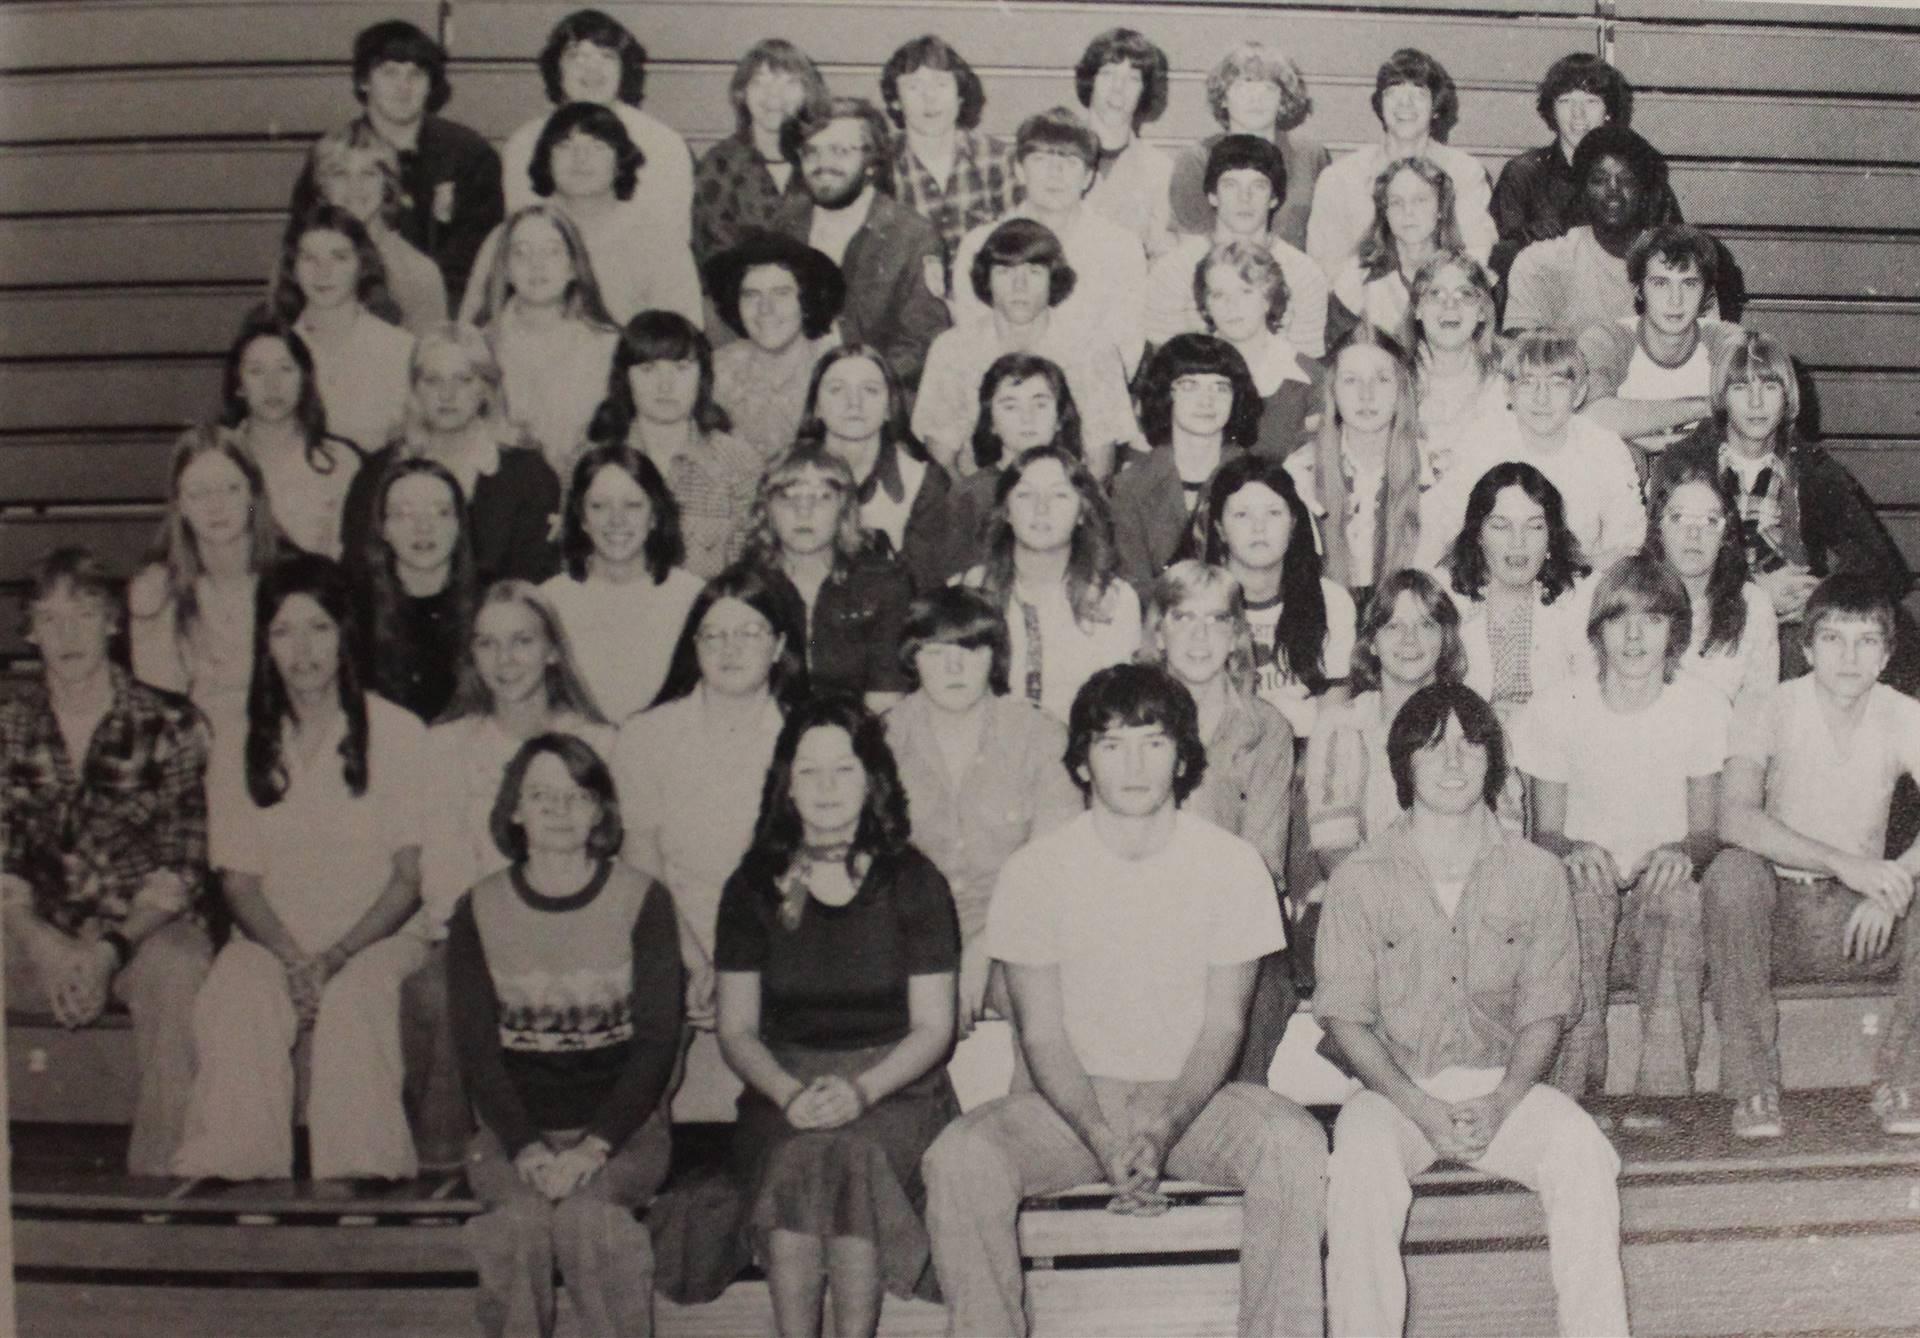 1977 College club